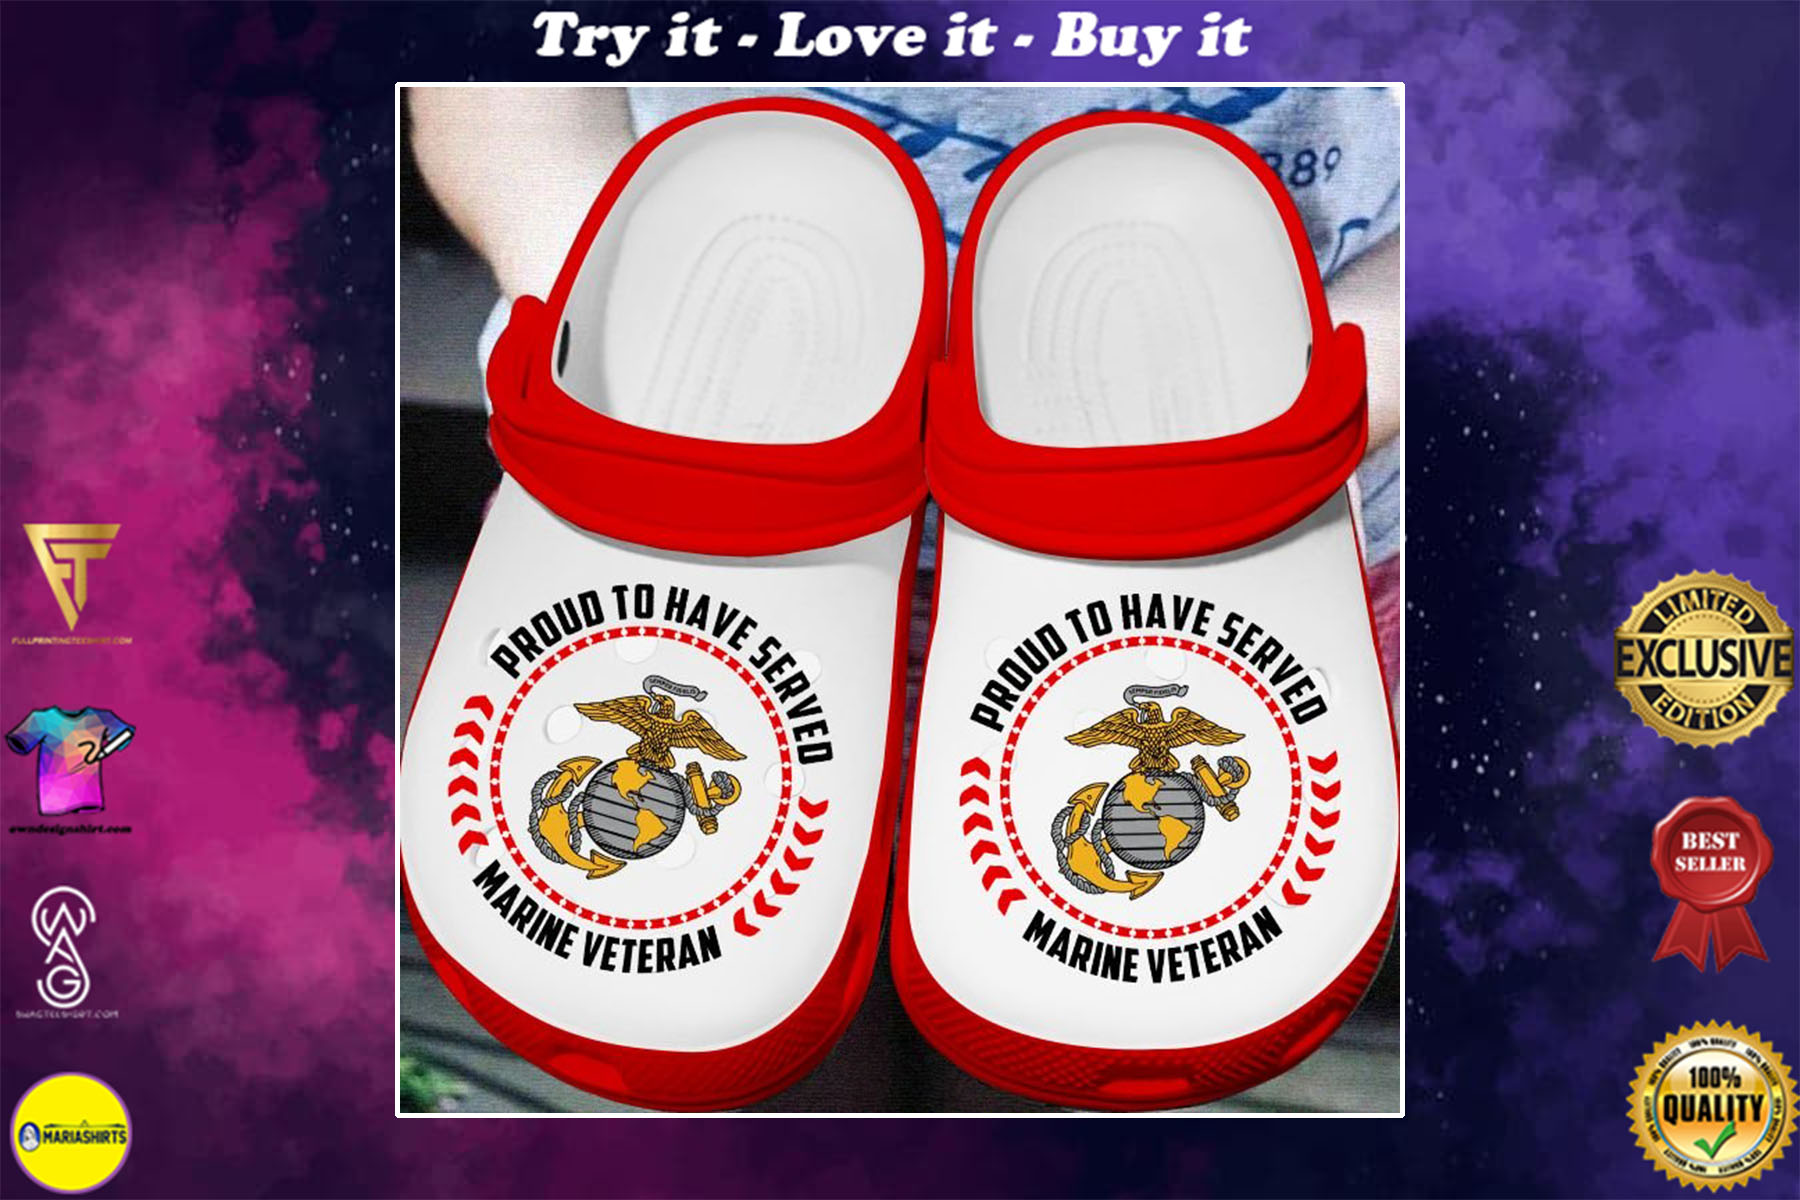 proud to have served marine veteran crocs - Copy